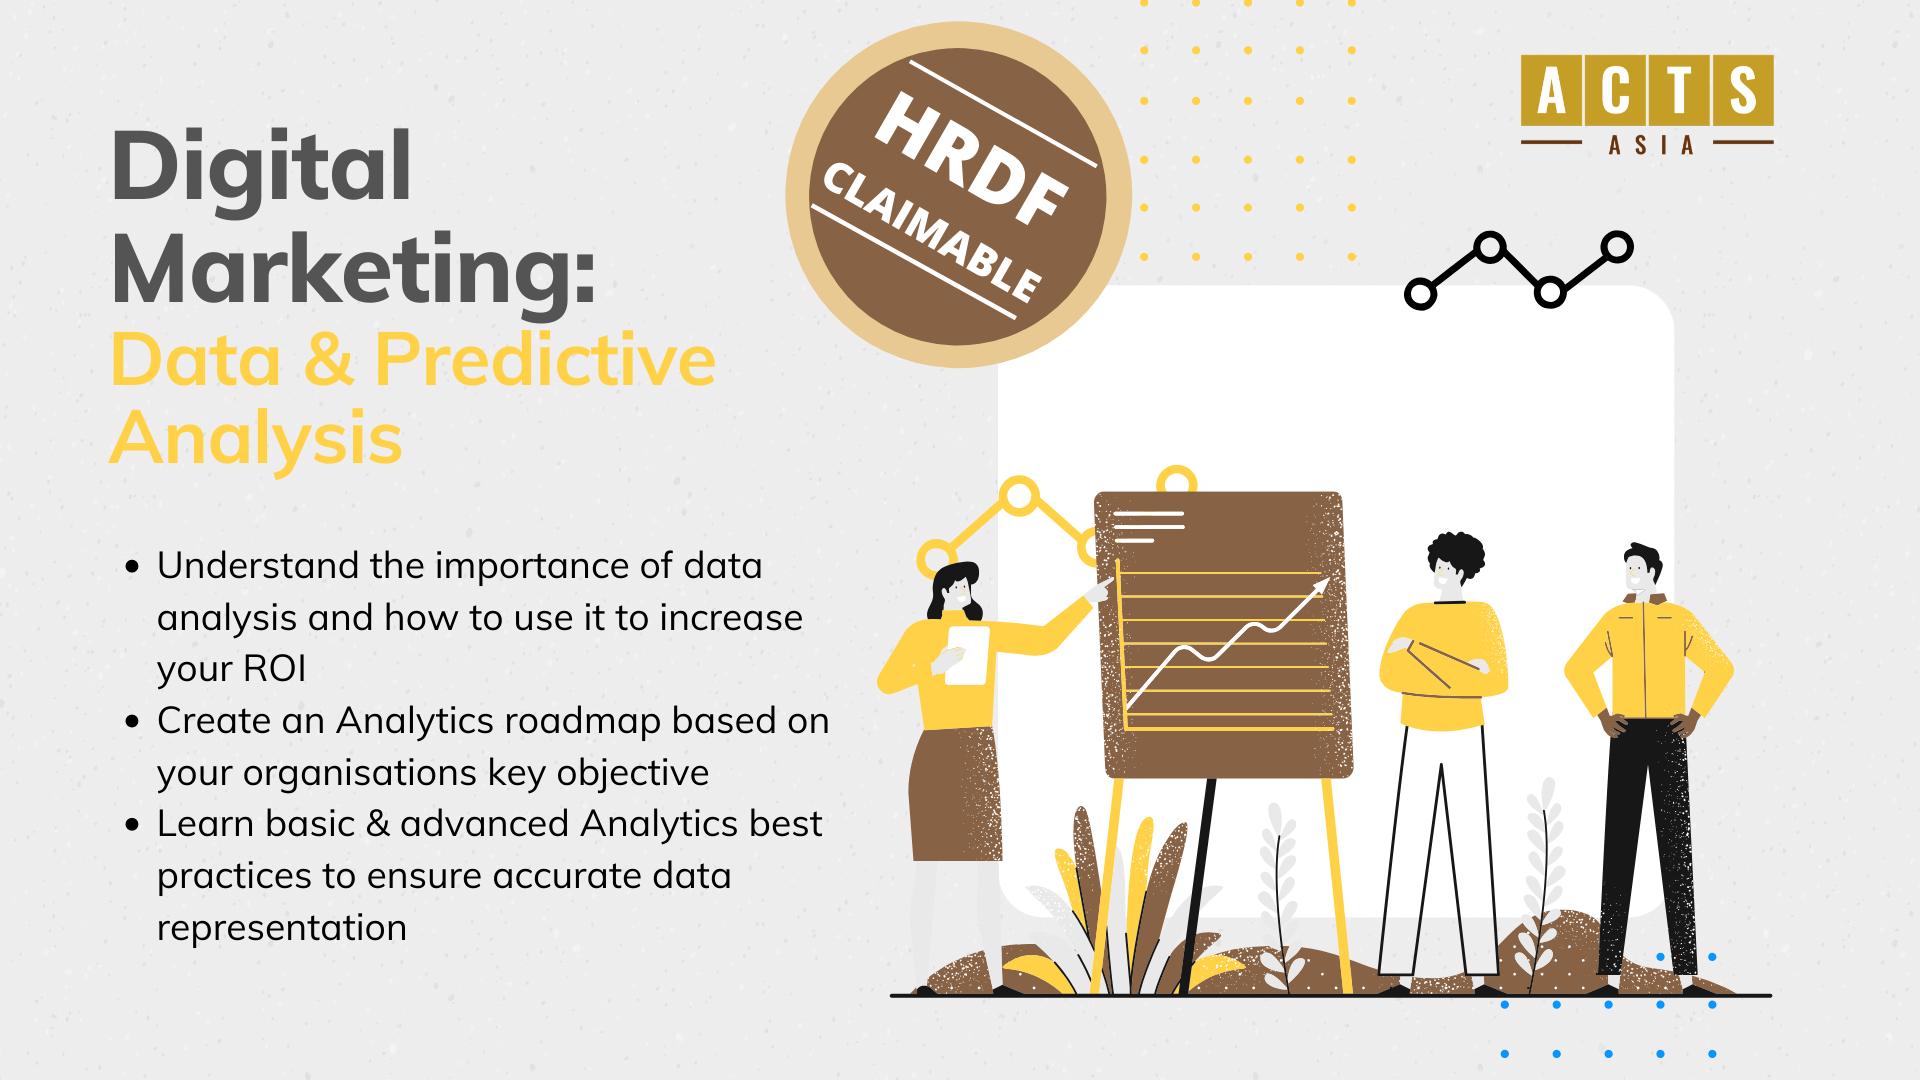 Digital Marketing: Data & Predictive Analysis